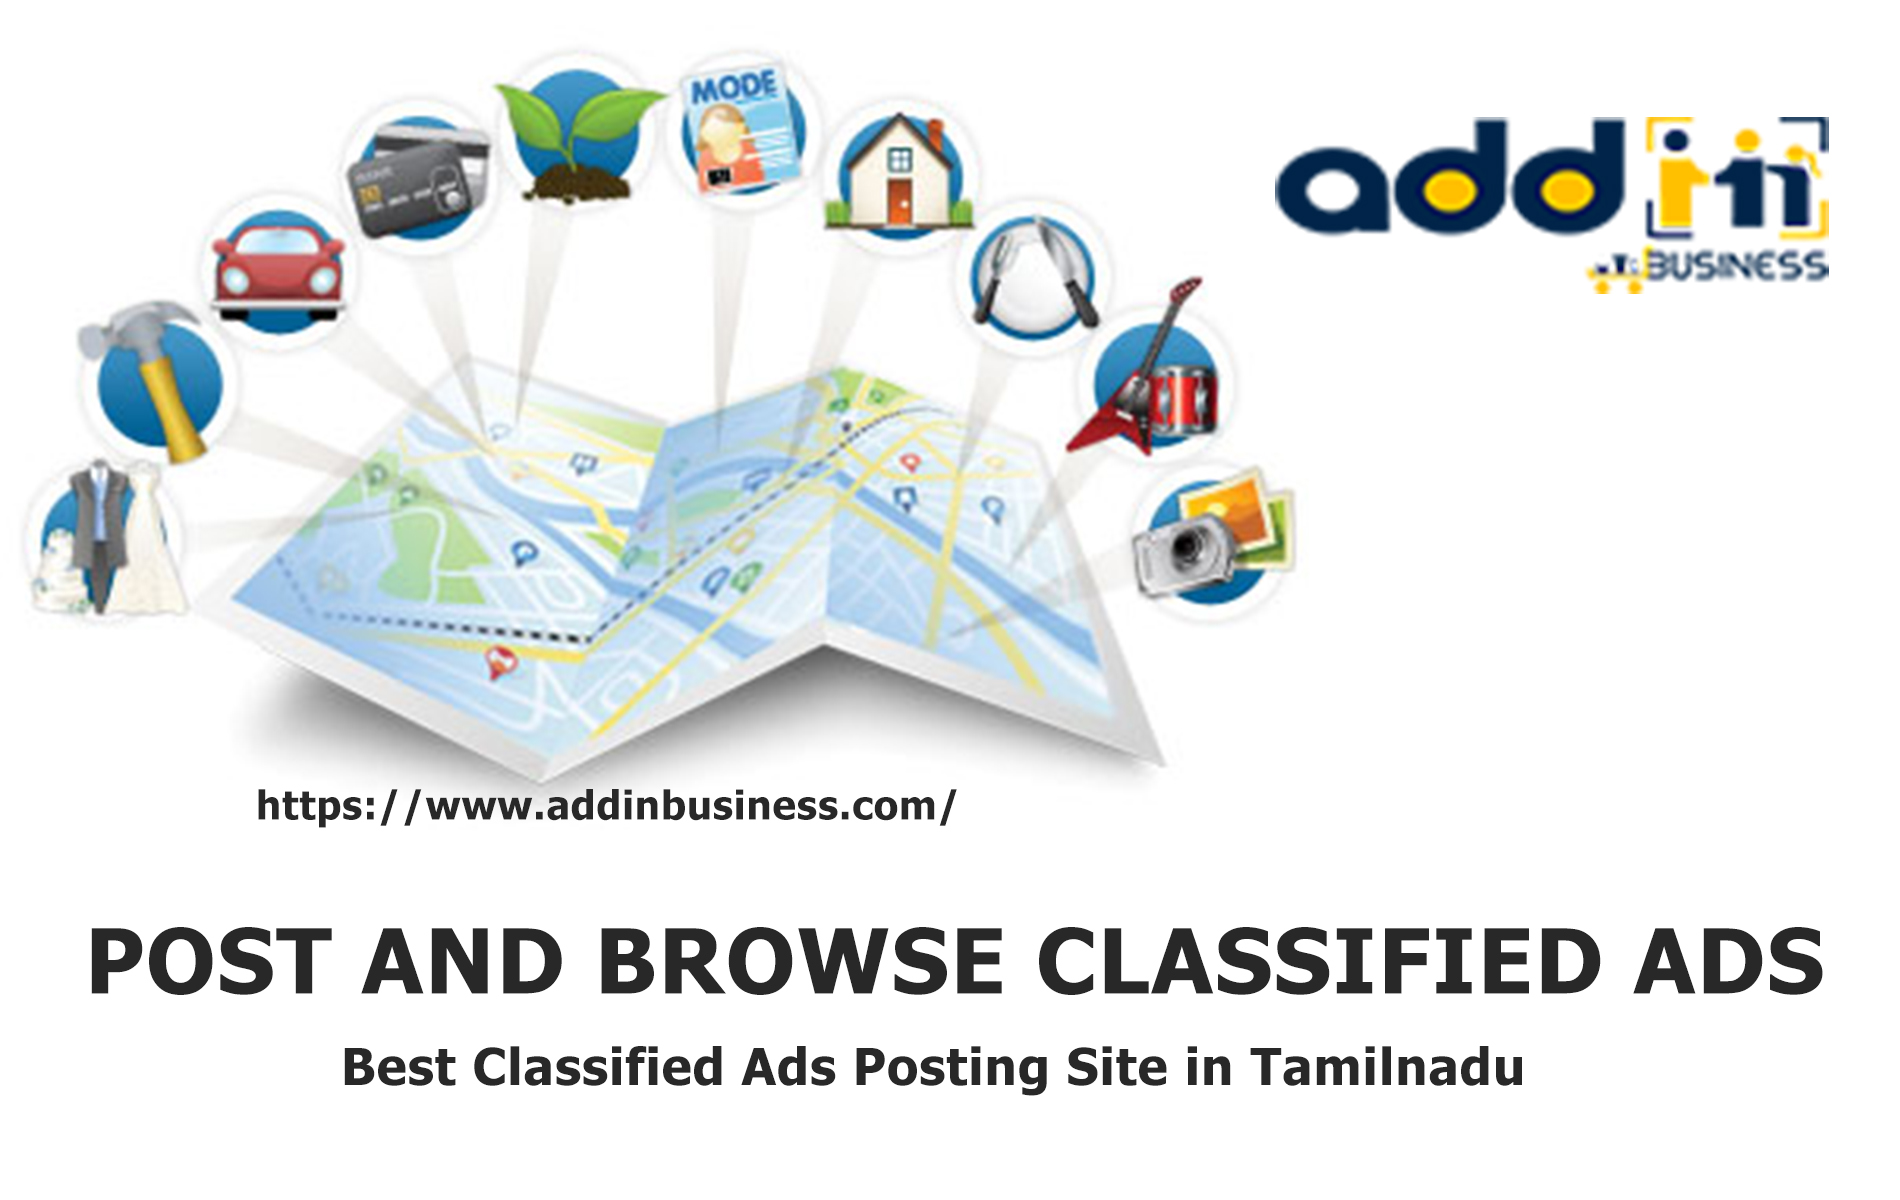 Free Classified Ads Posting Site in Tamilnadu